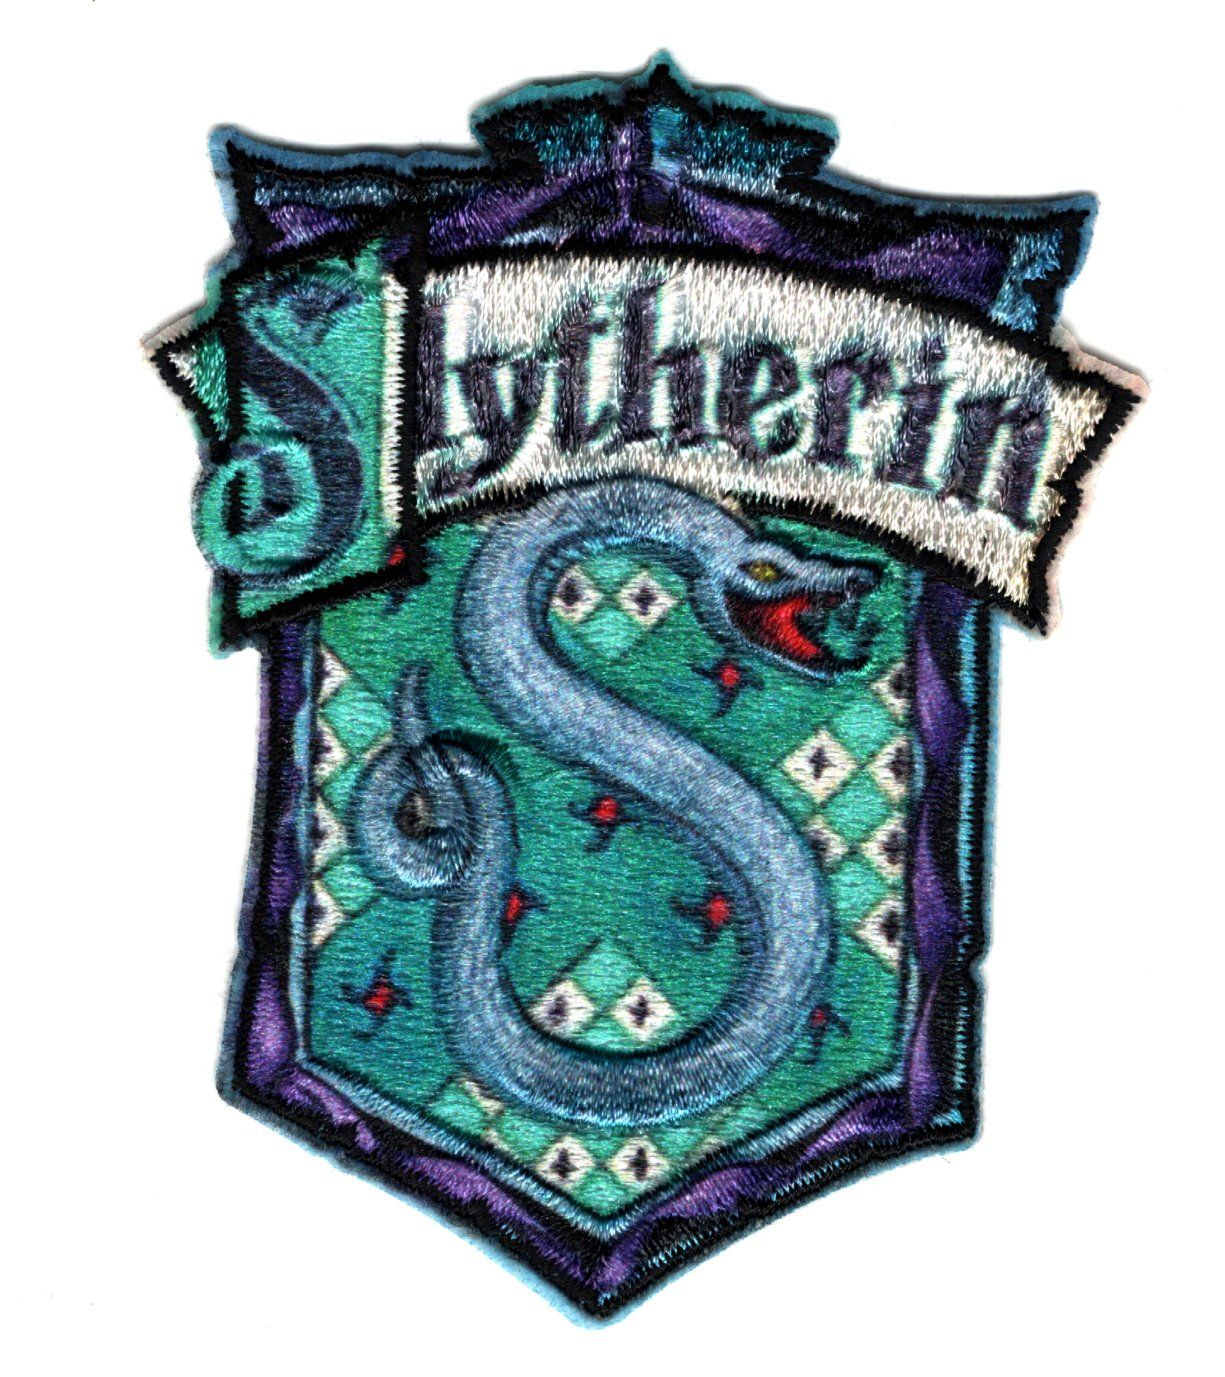 Blason Harry Potter Dessin - Dessin et Coloriage